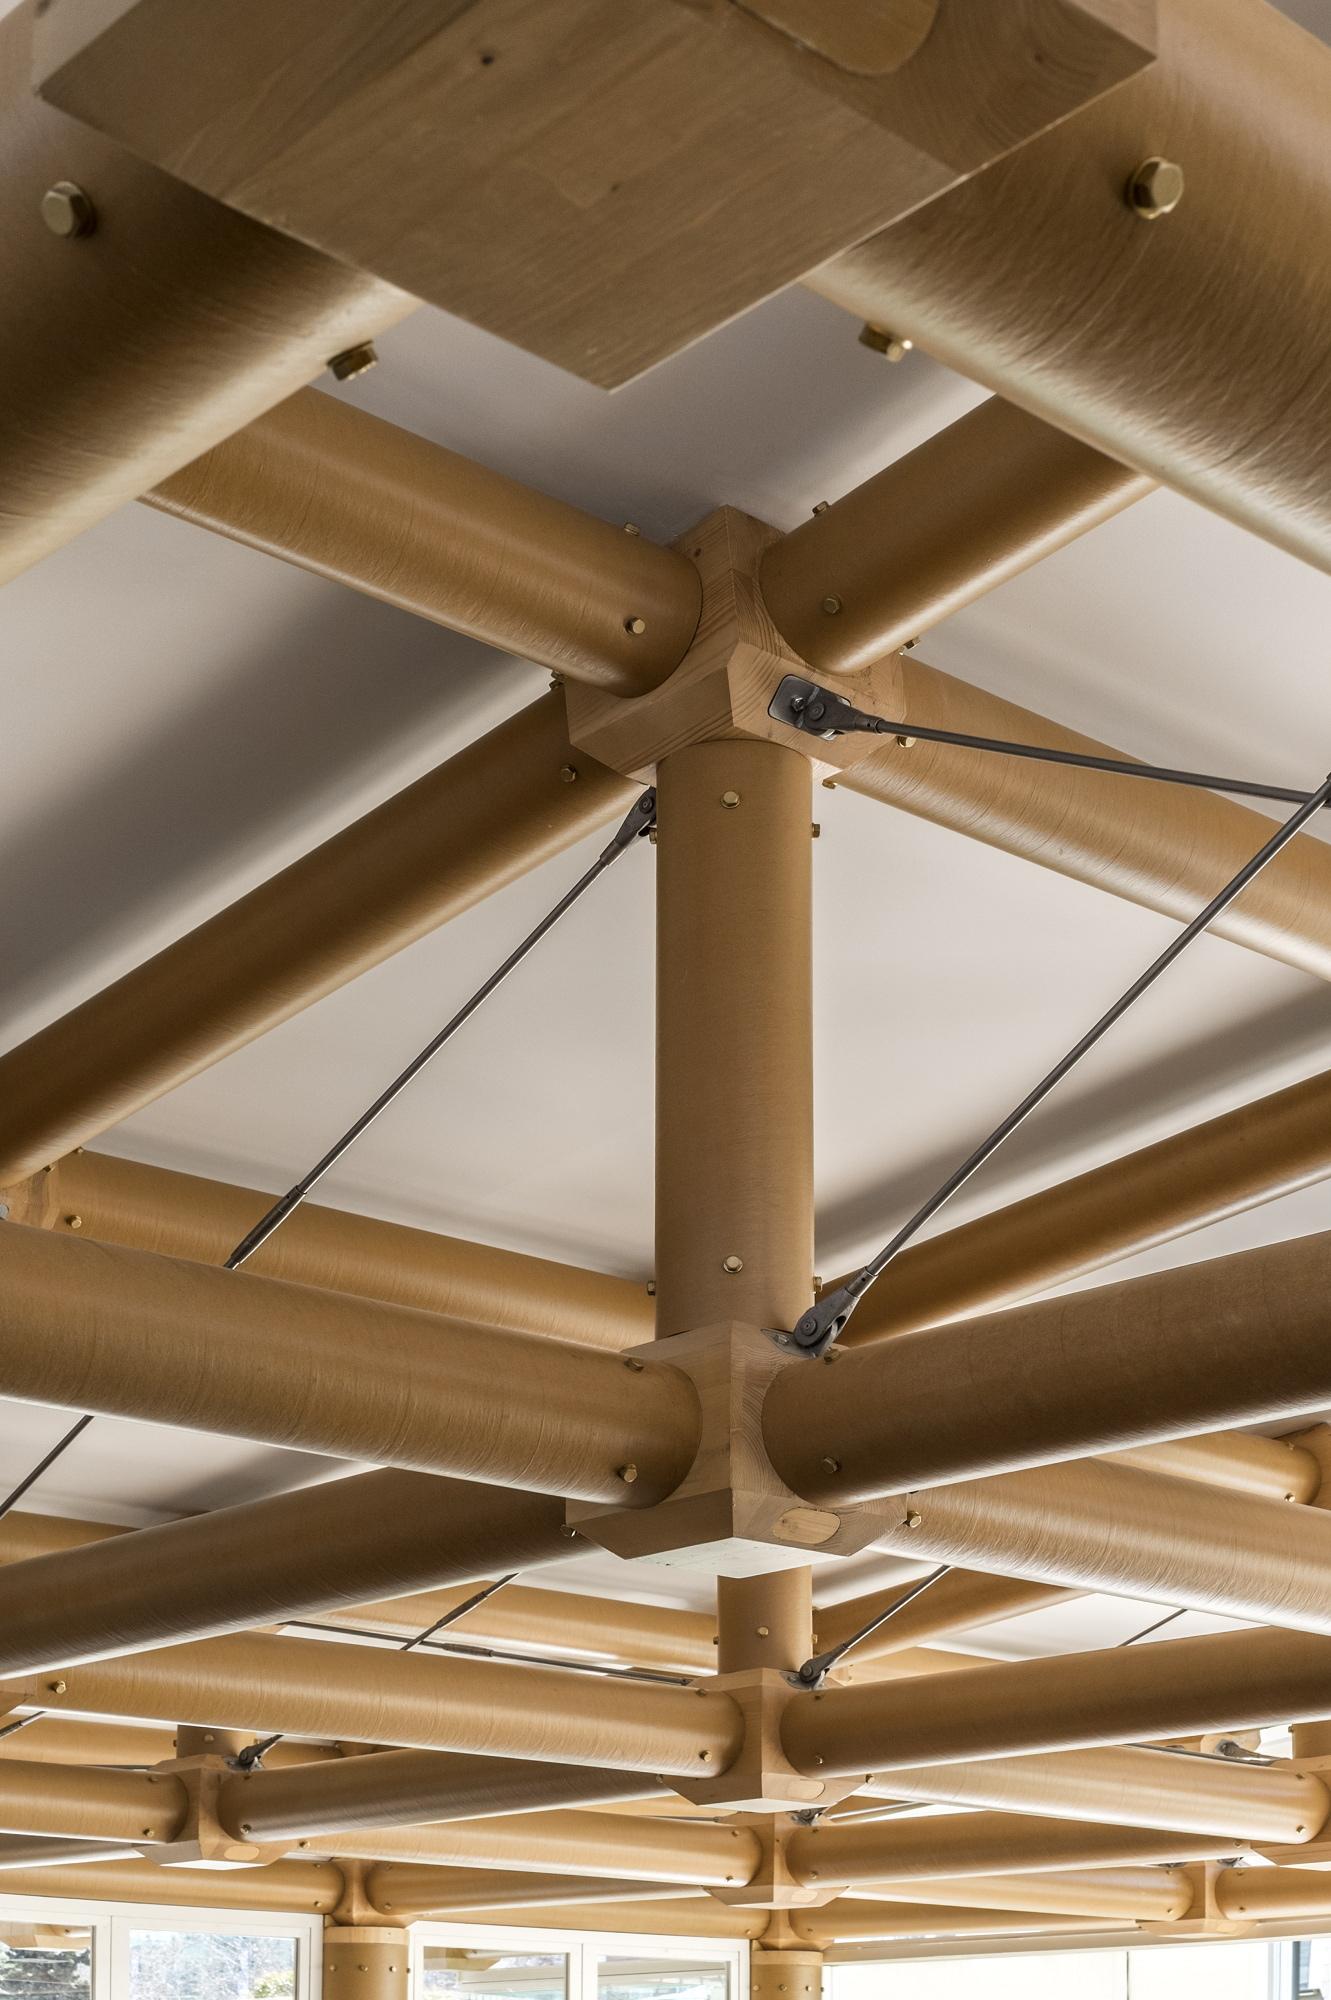 Gallery Of Ie Paper Pavilion Shigeru Ban Architects 2